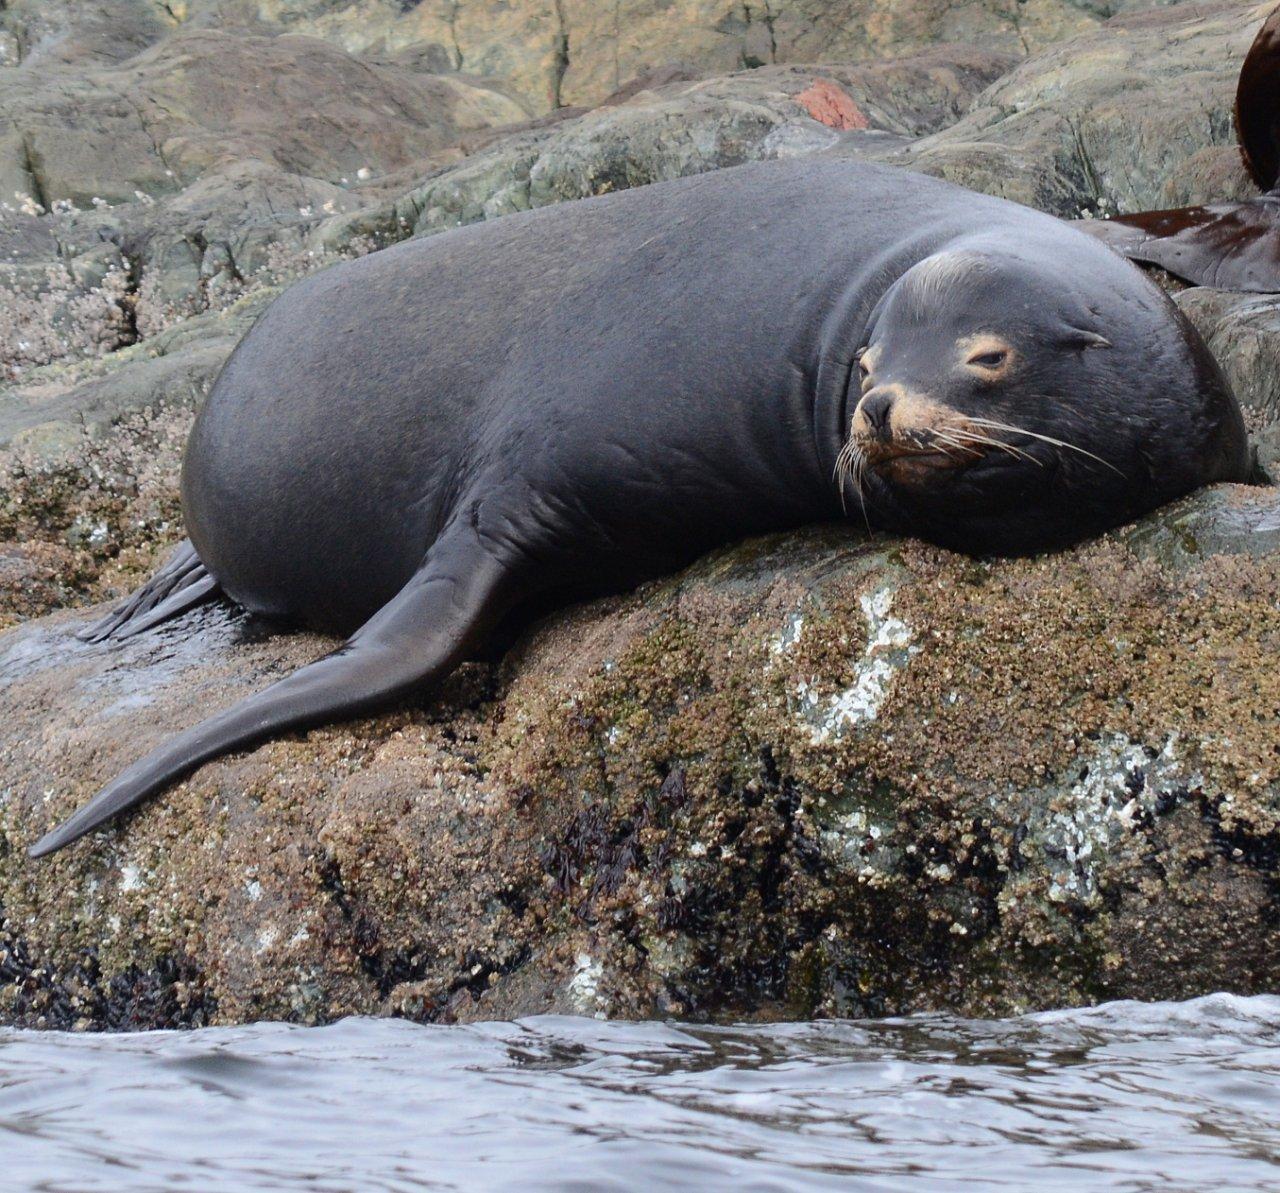 07 California sea lion at Upwood Point.JPG